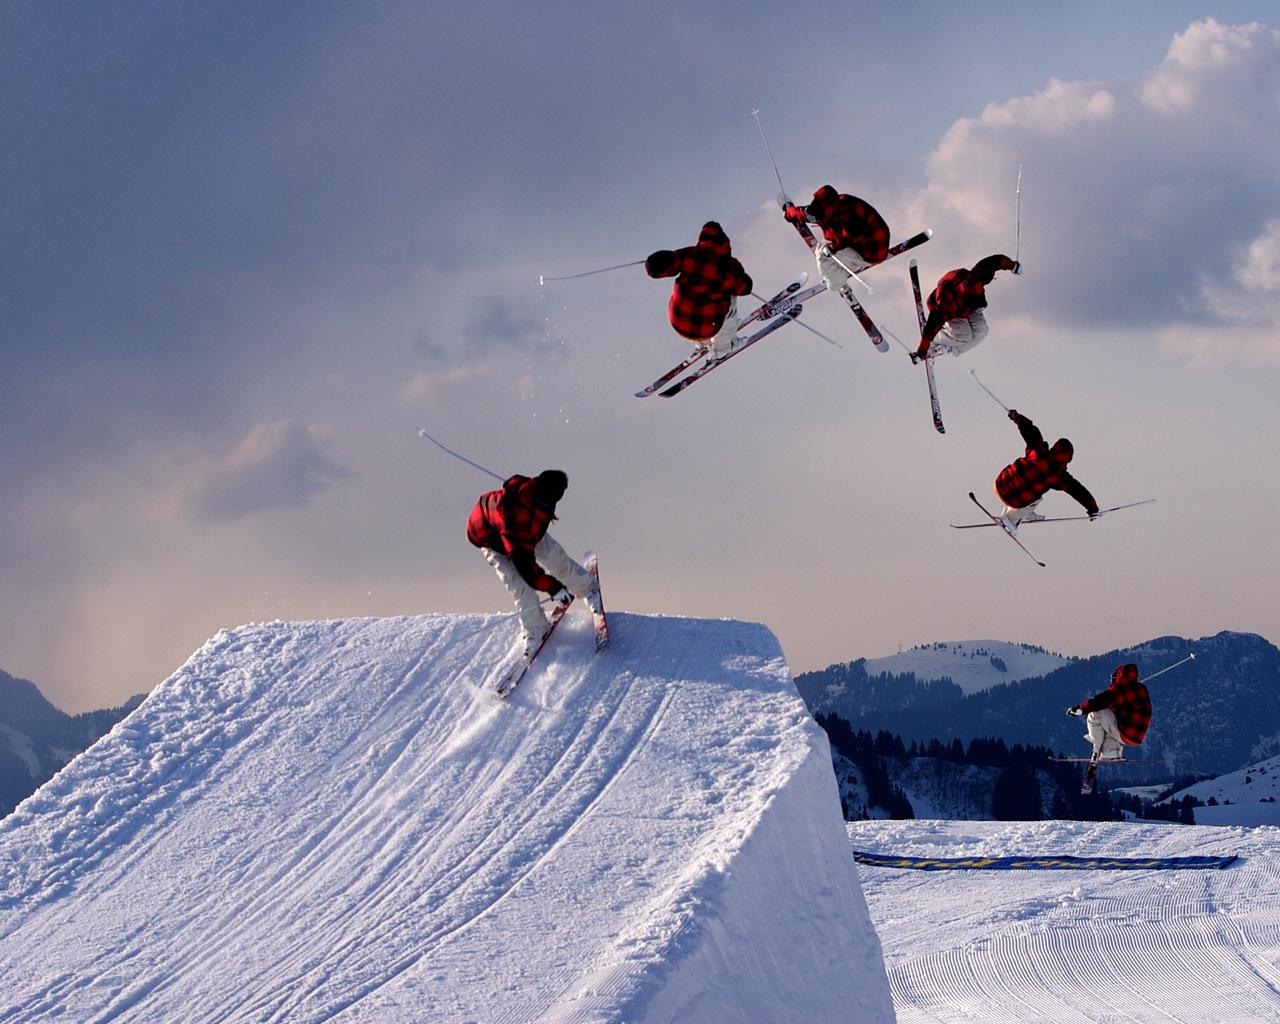 freestyle skiing wallpaper - photo #38